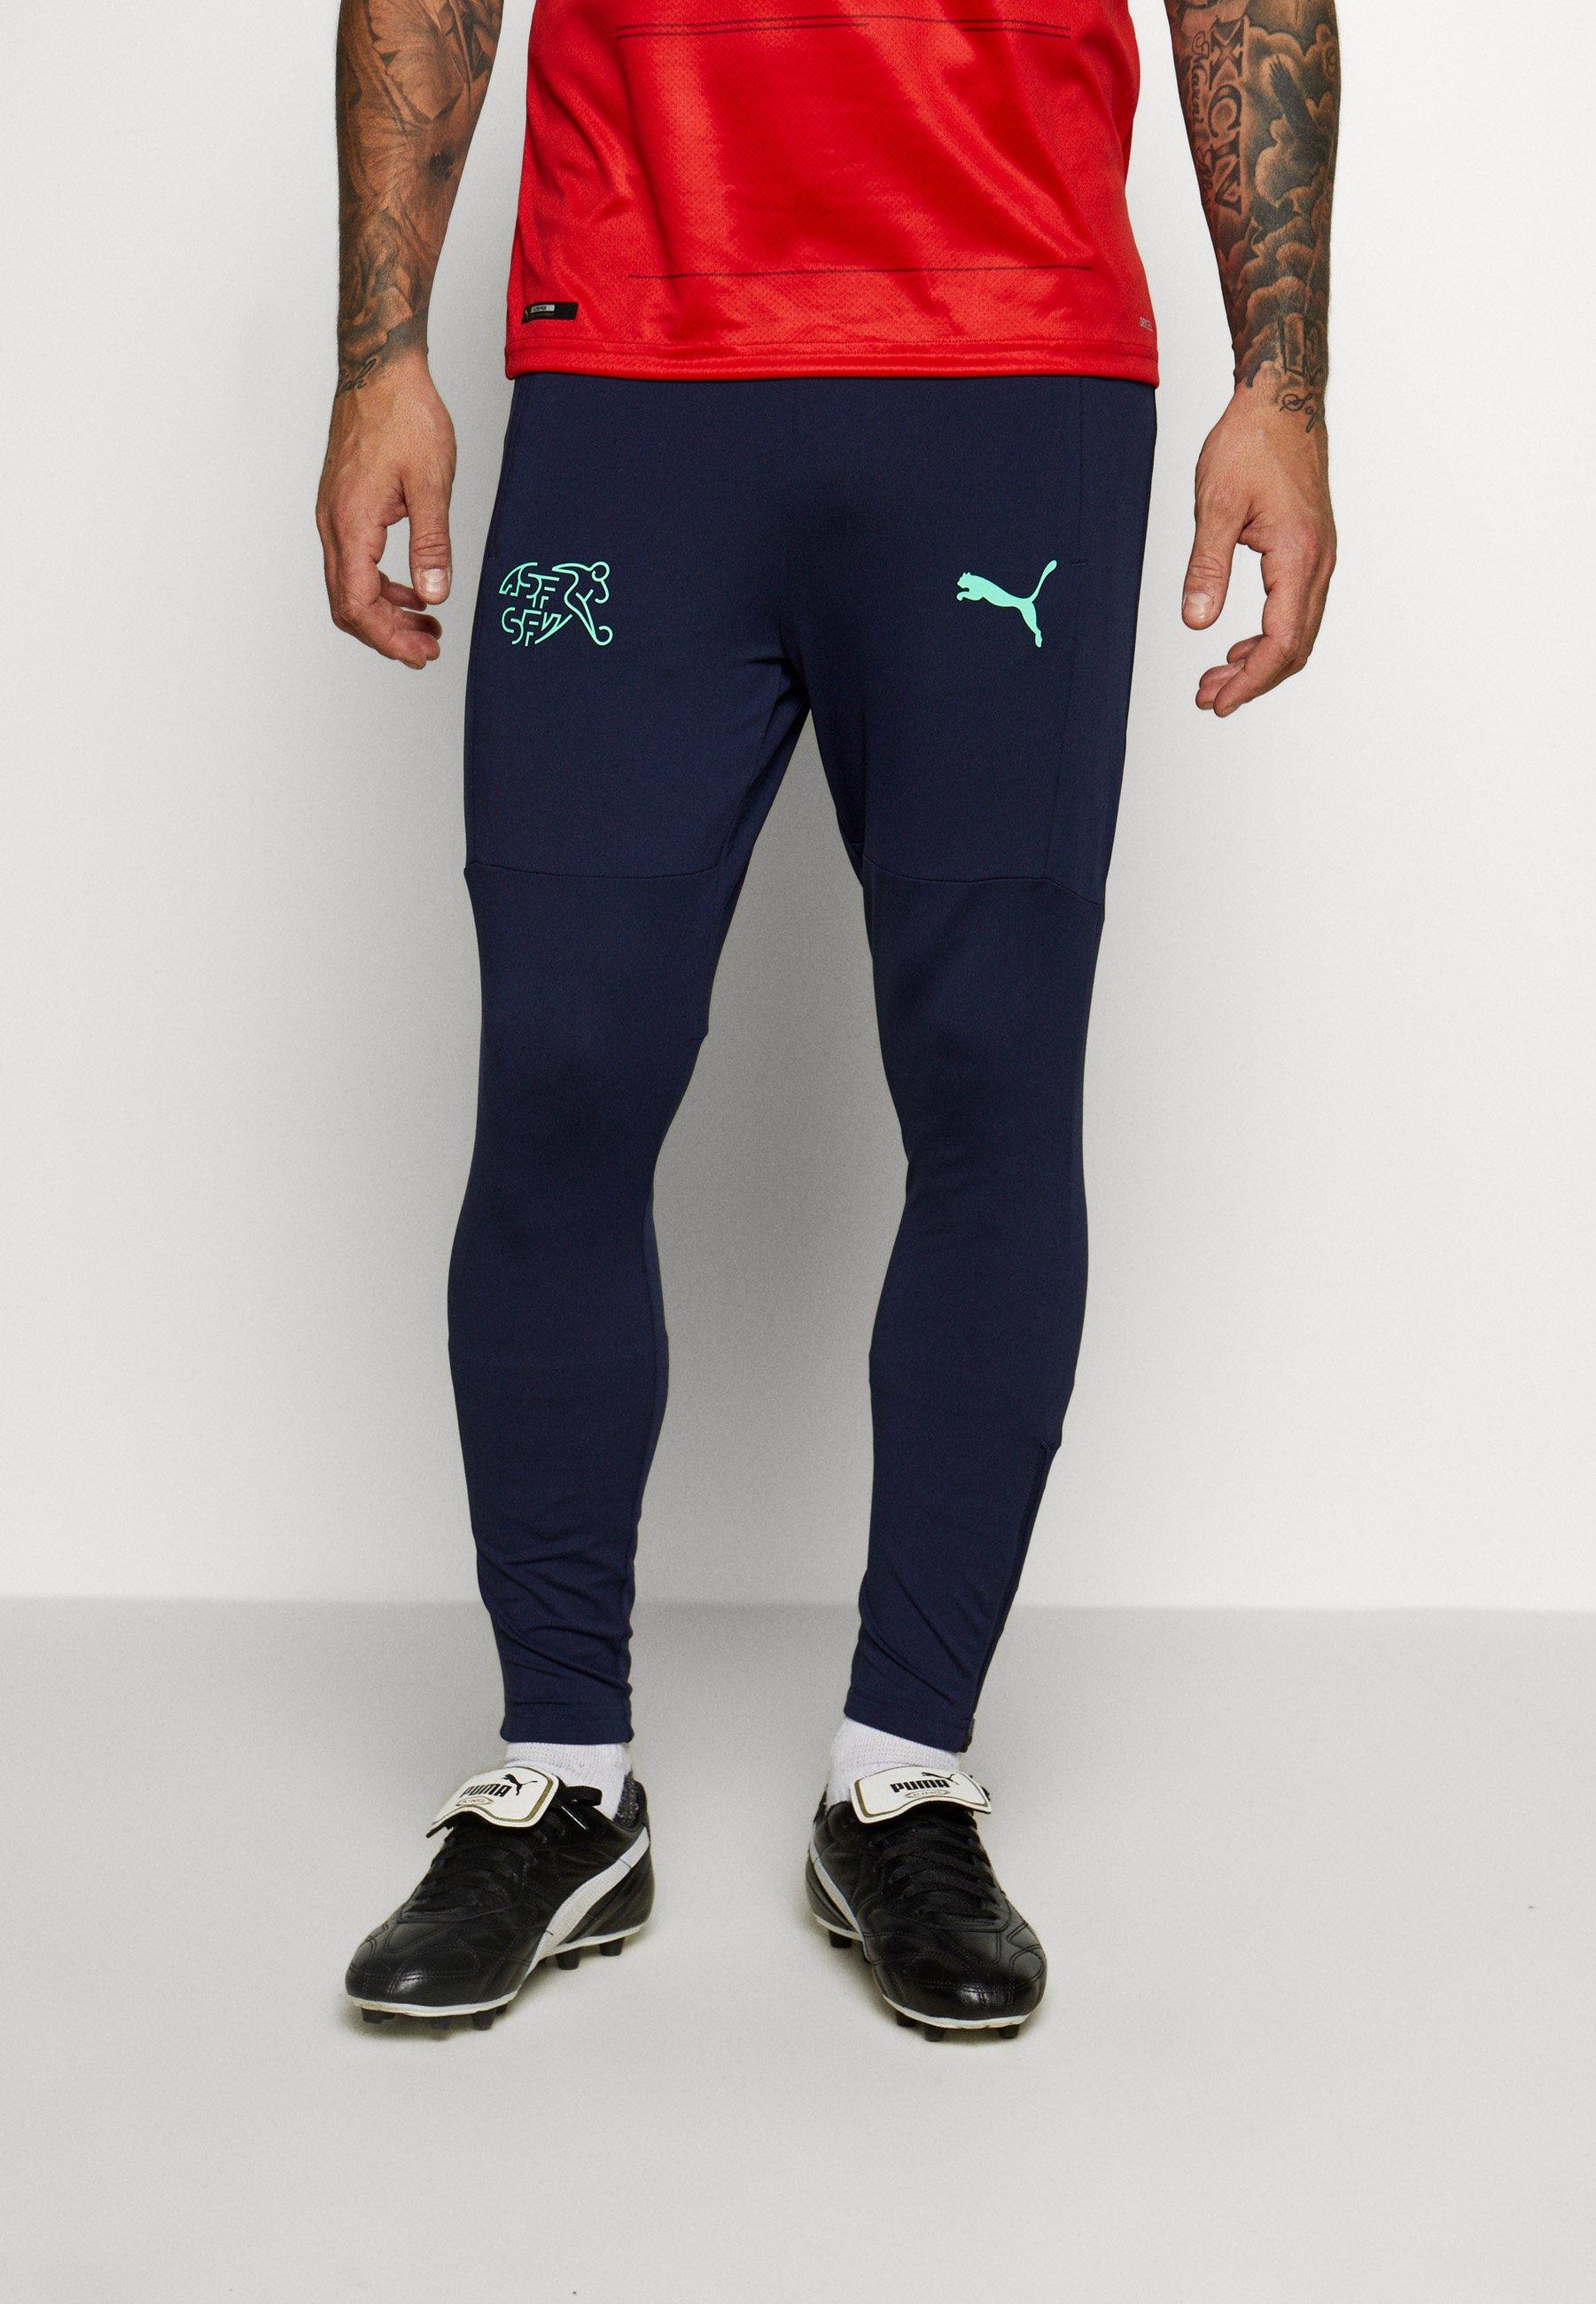 Puma Schweiz Sfv Training Pants Zip Pockets Zip Legs Tracksuit Bottoms Peacoat Green Glimmer Zalando Ie